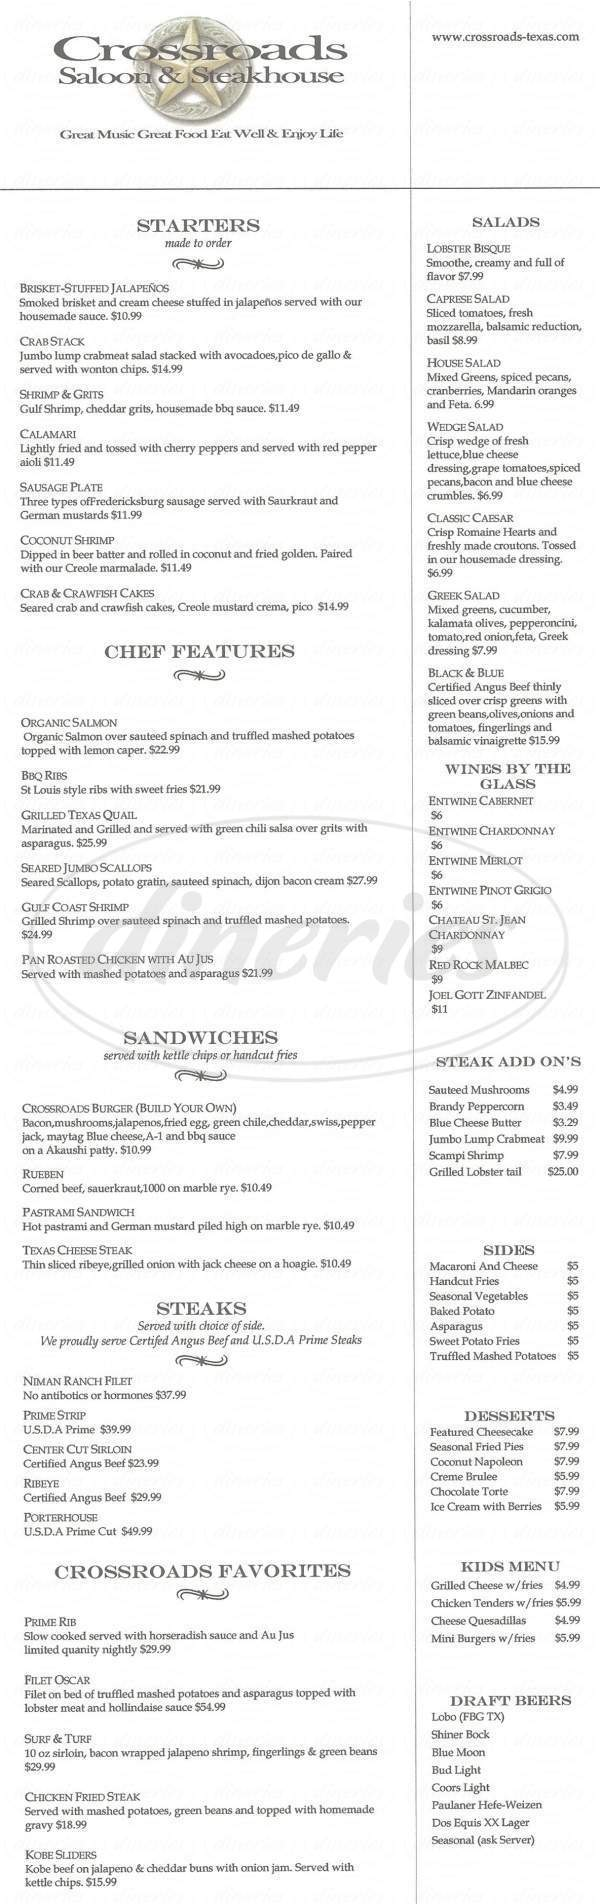 menu for Crossroads Saloon & Steakhouse